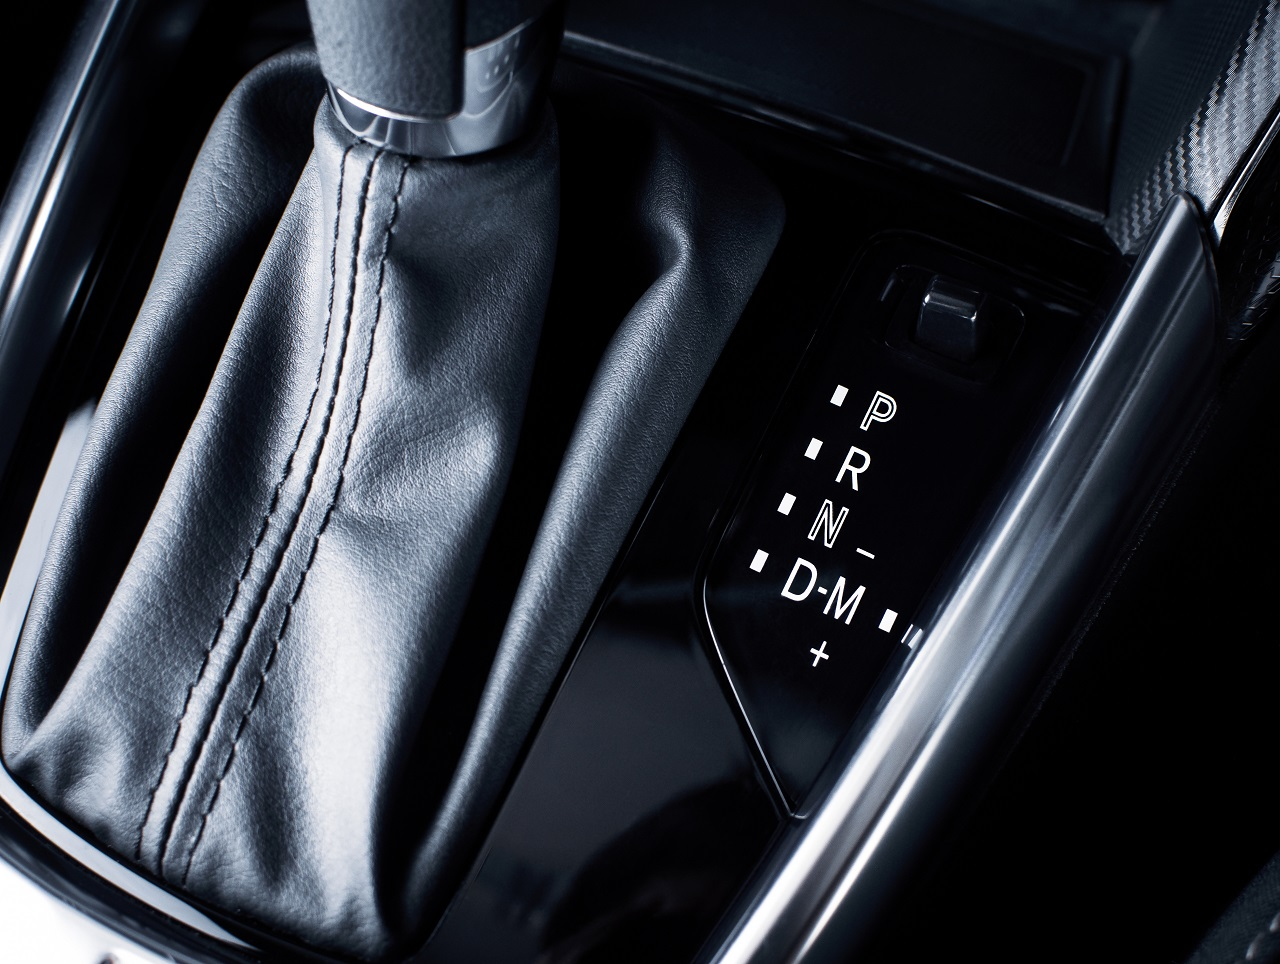 Close up of a car's gear shift